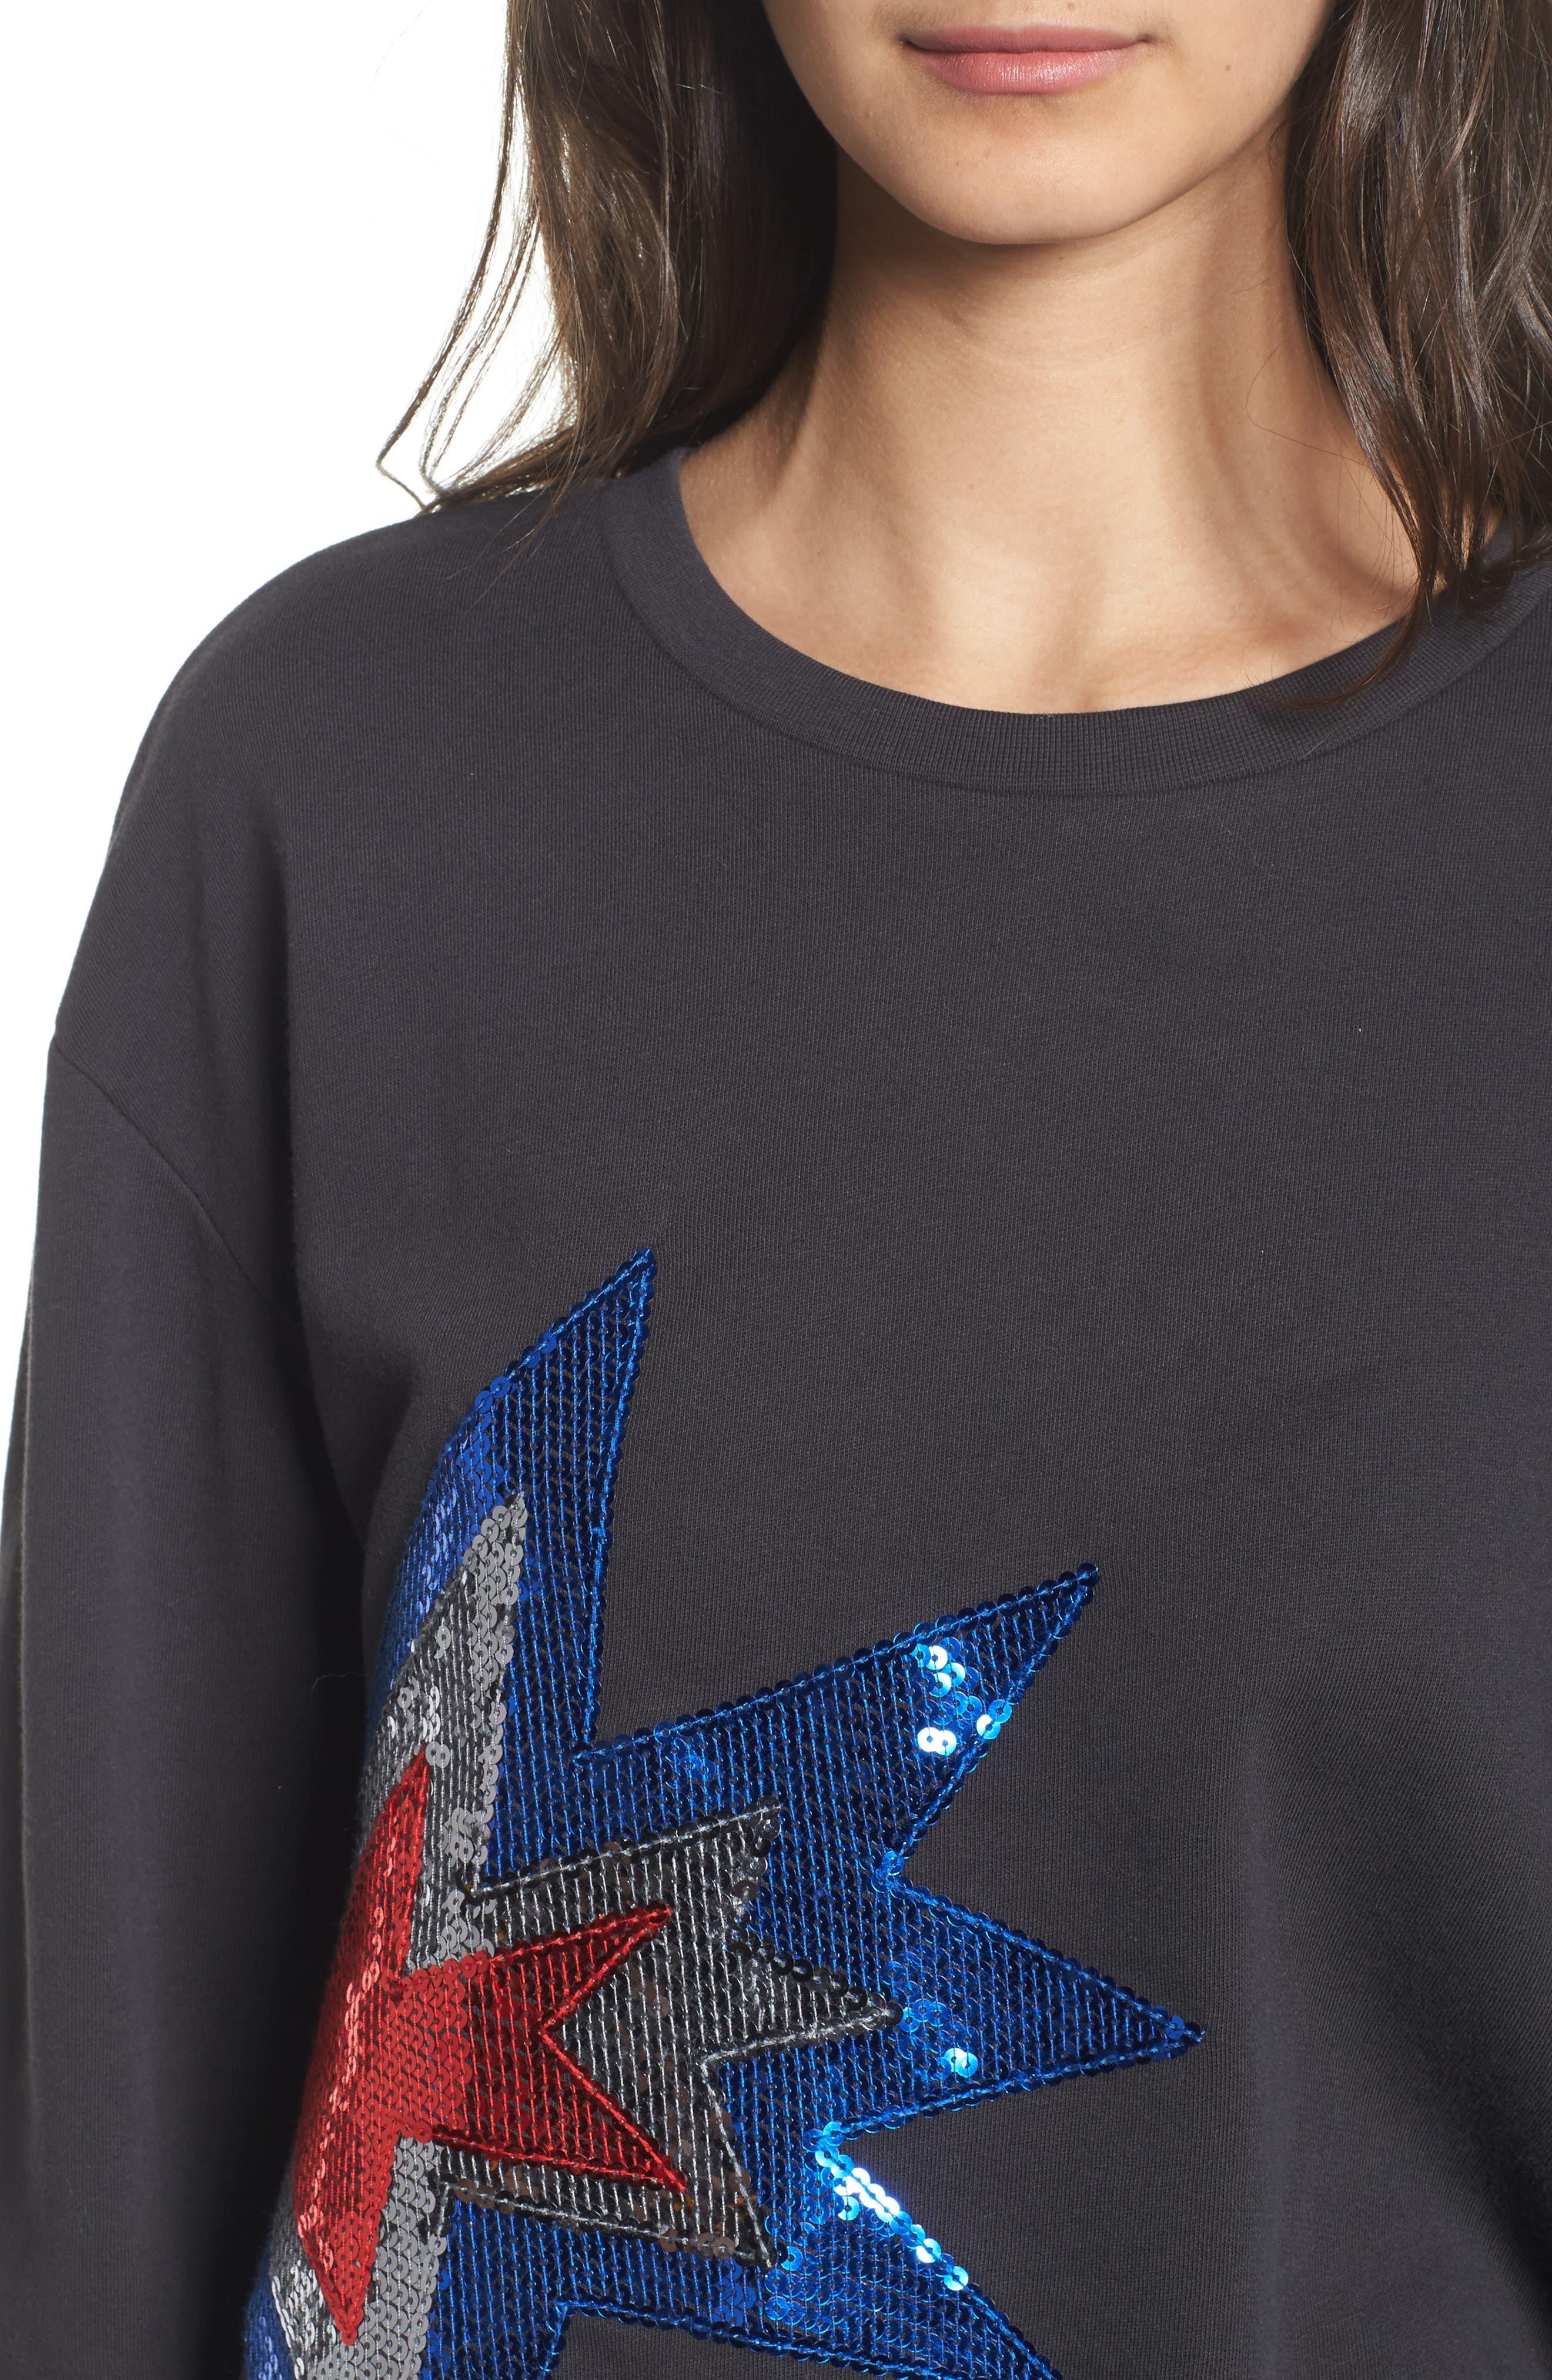 Alexa - Splash Sweatshirt,                             Alternate thumbnail 4, color,                             Black